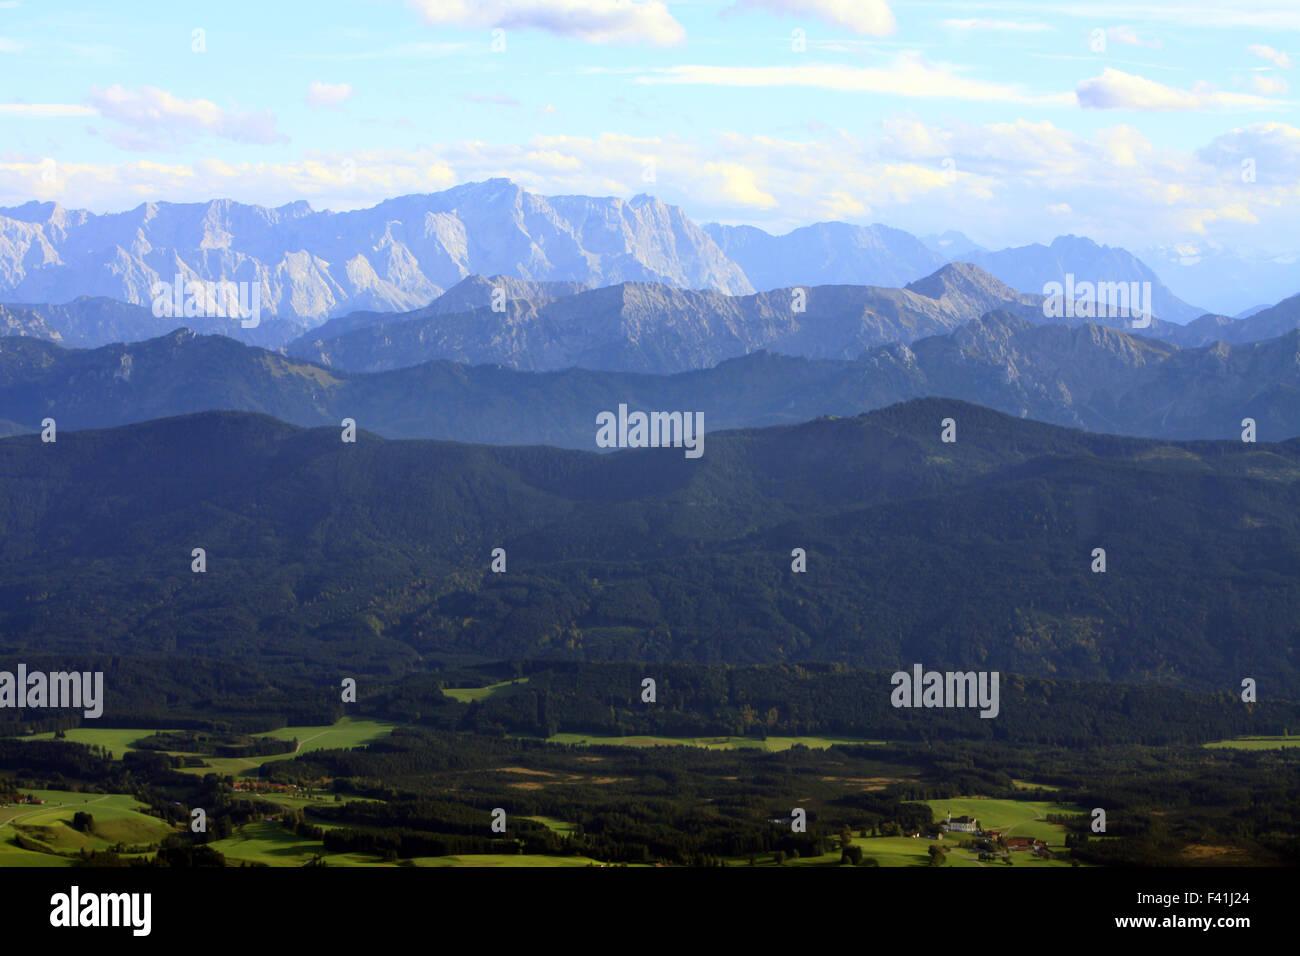 Allgäu and the Mountins of the Alps - Stock Image